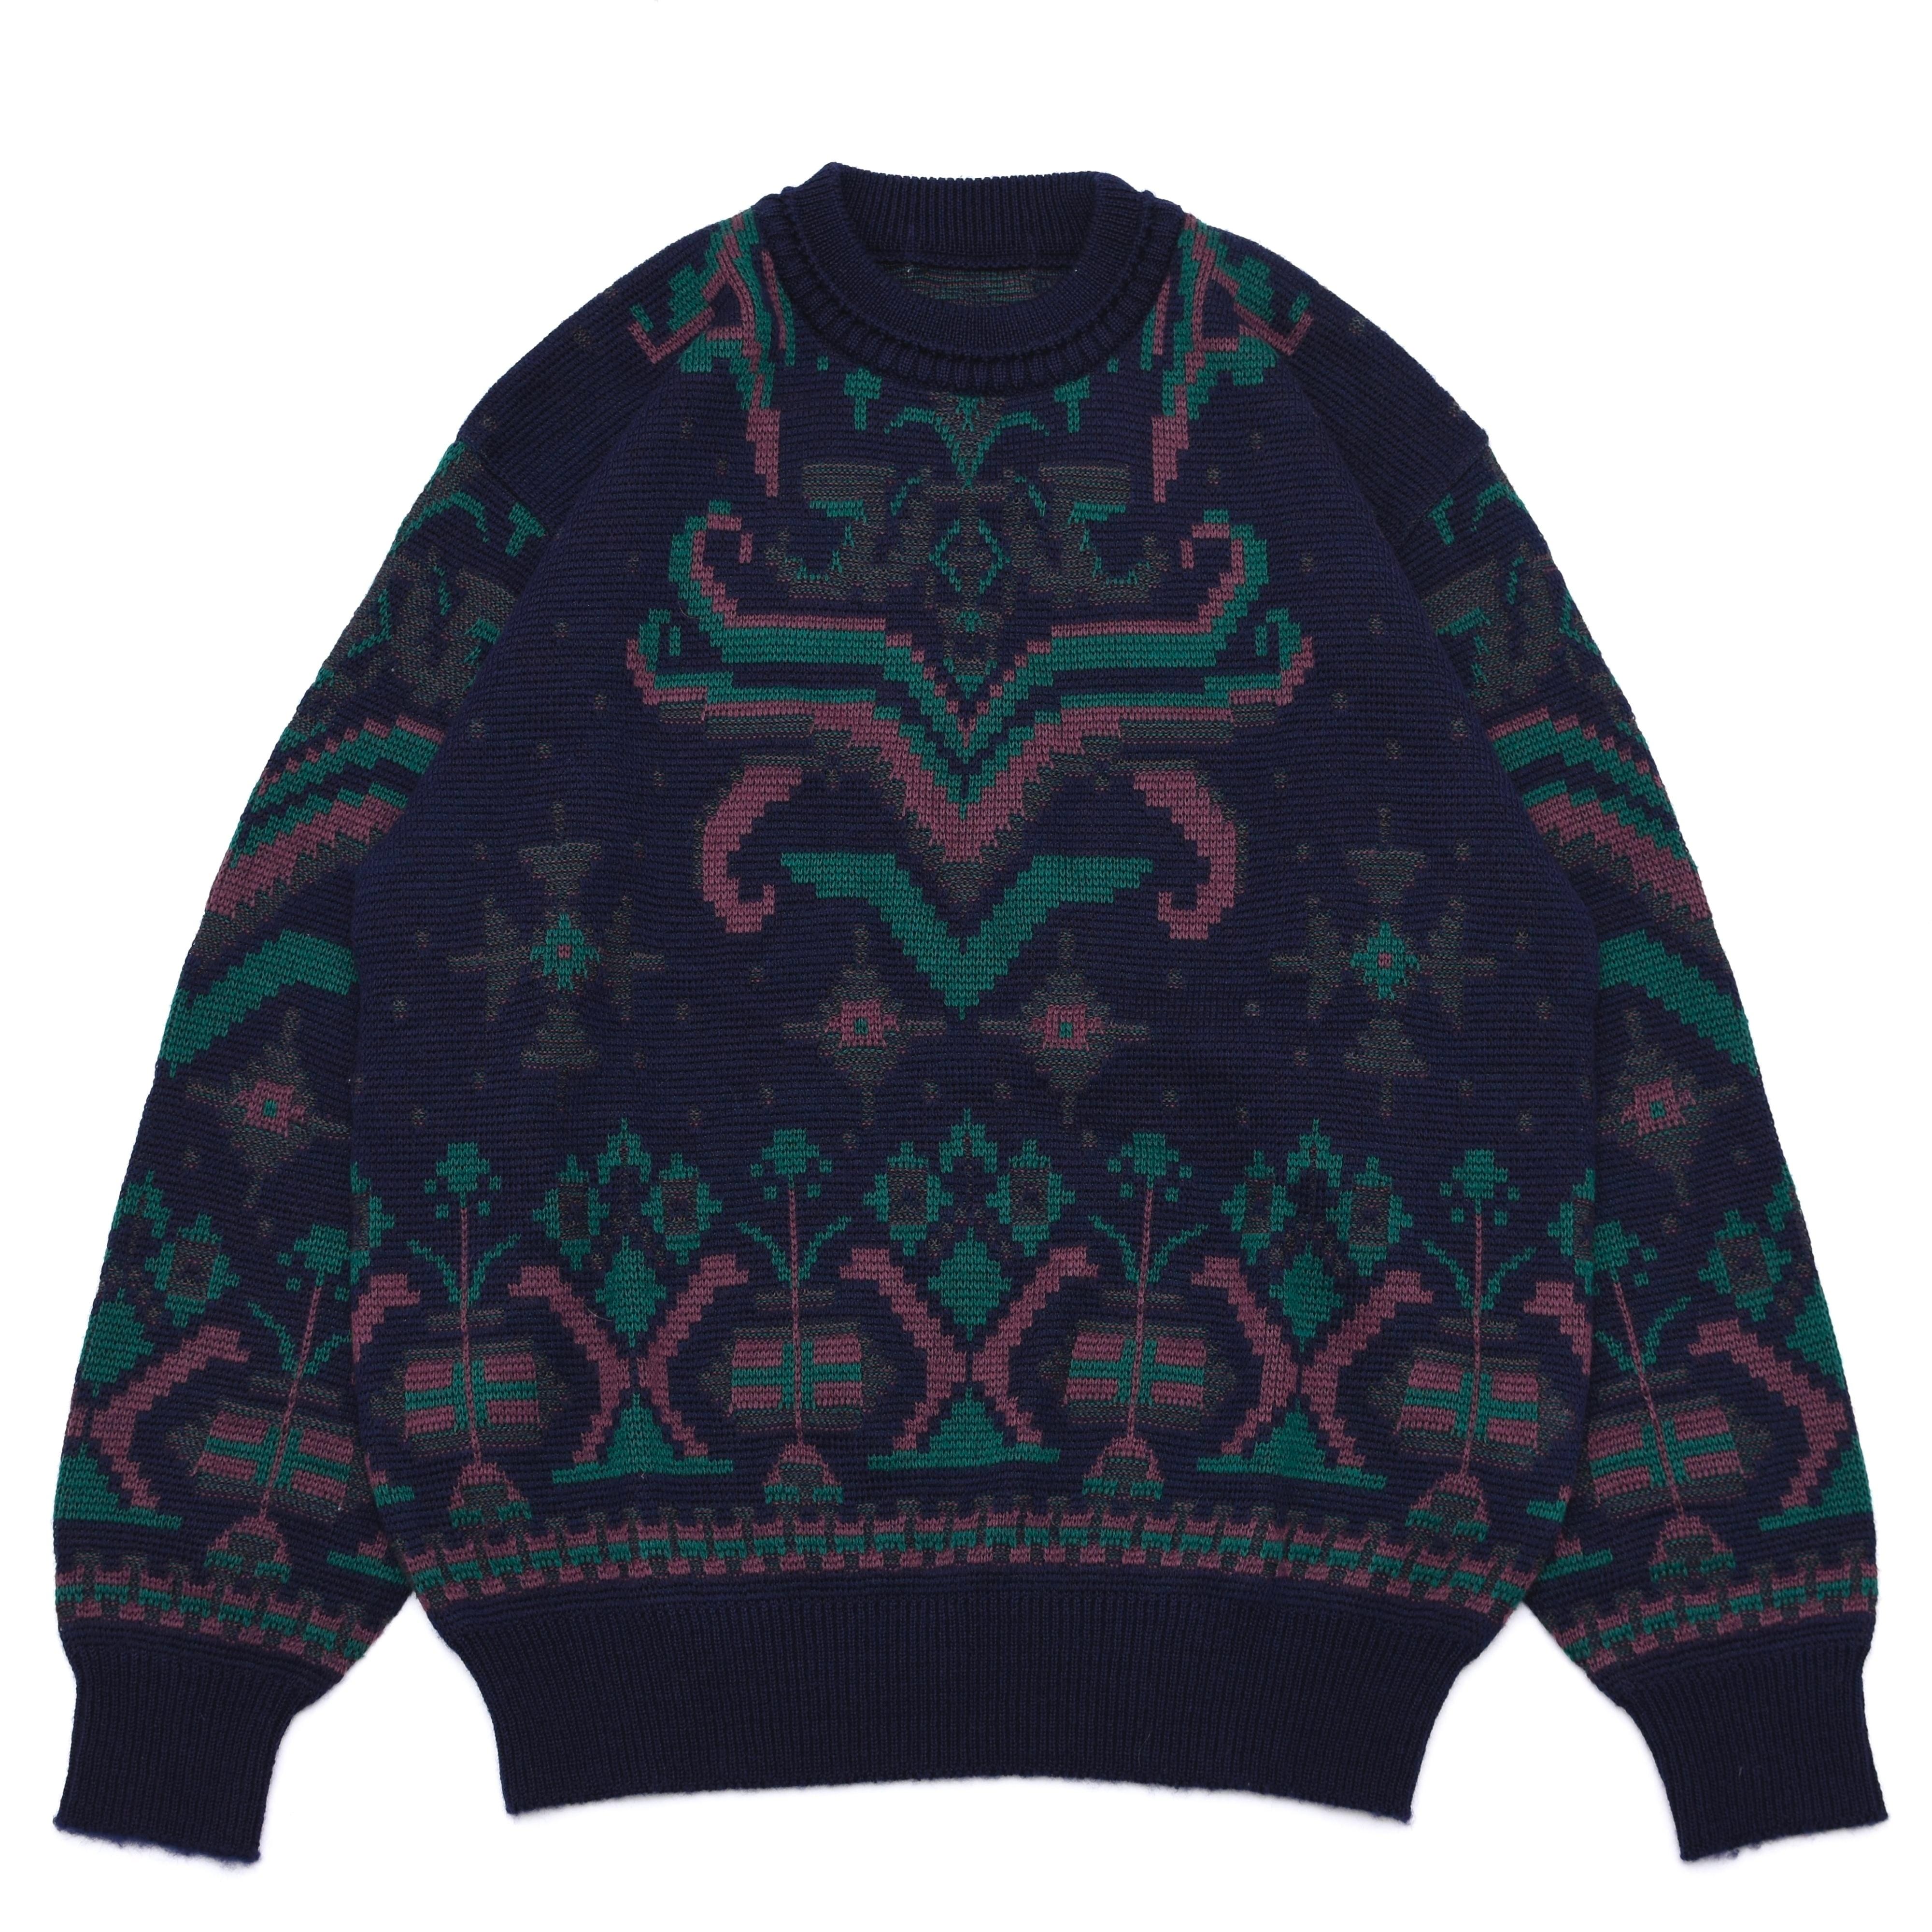 Geometric jacquard pattern pullover knit